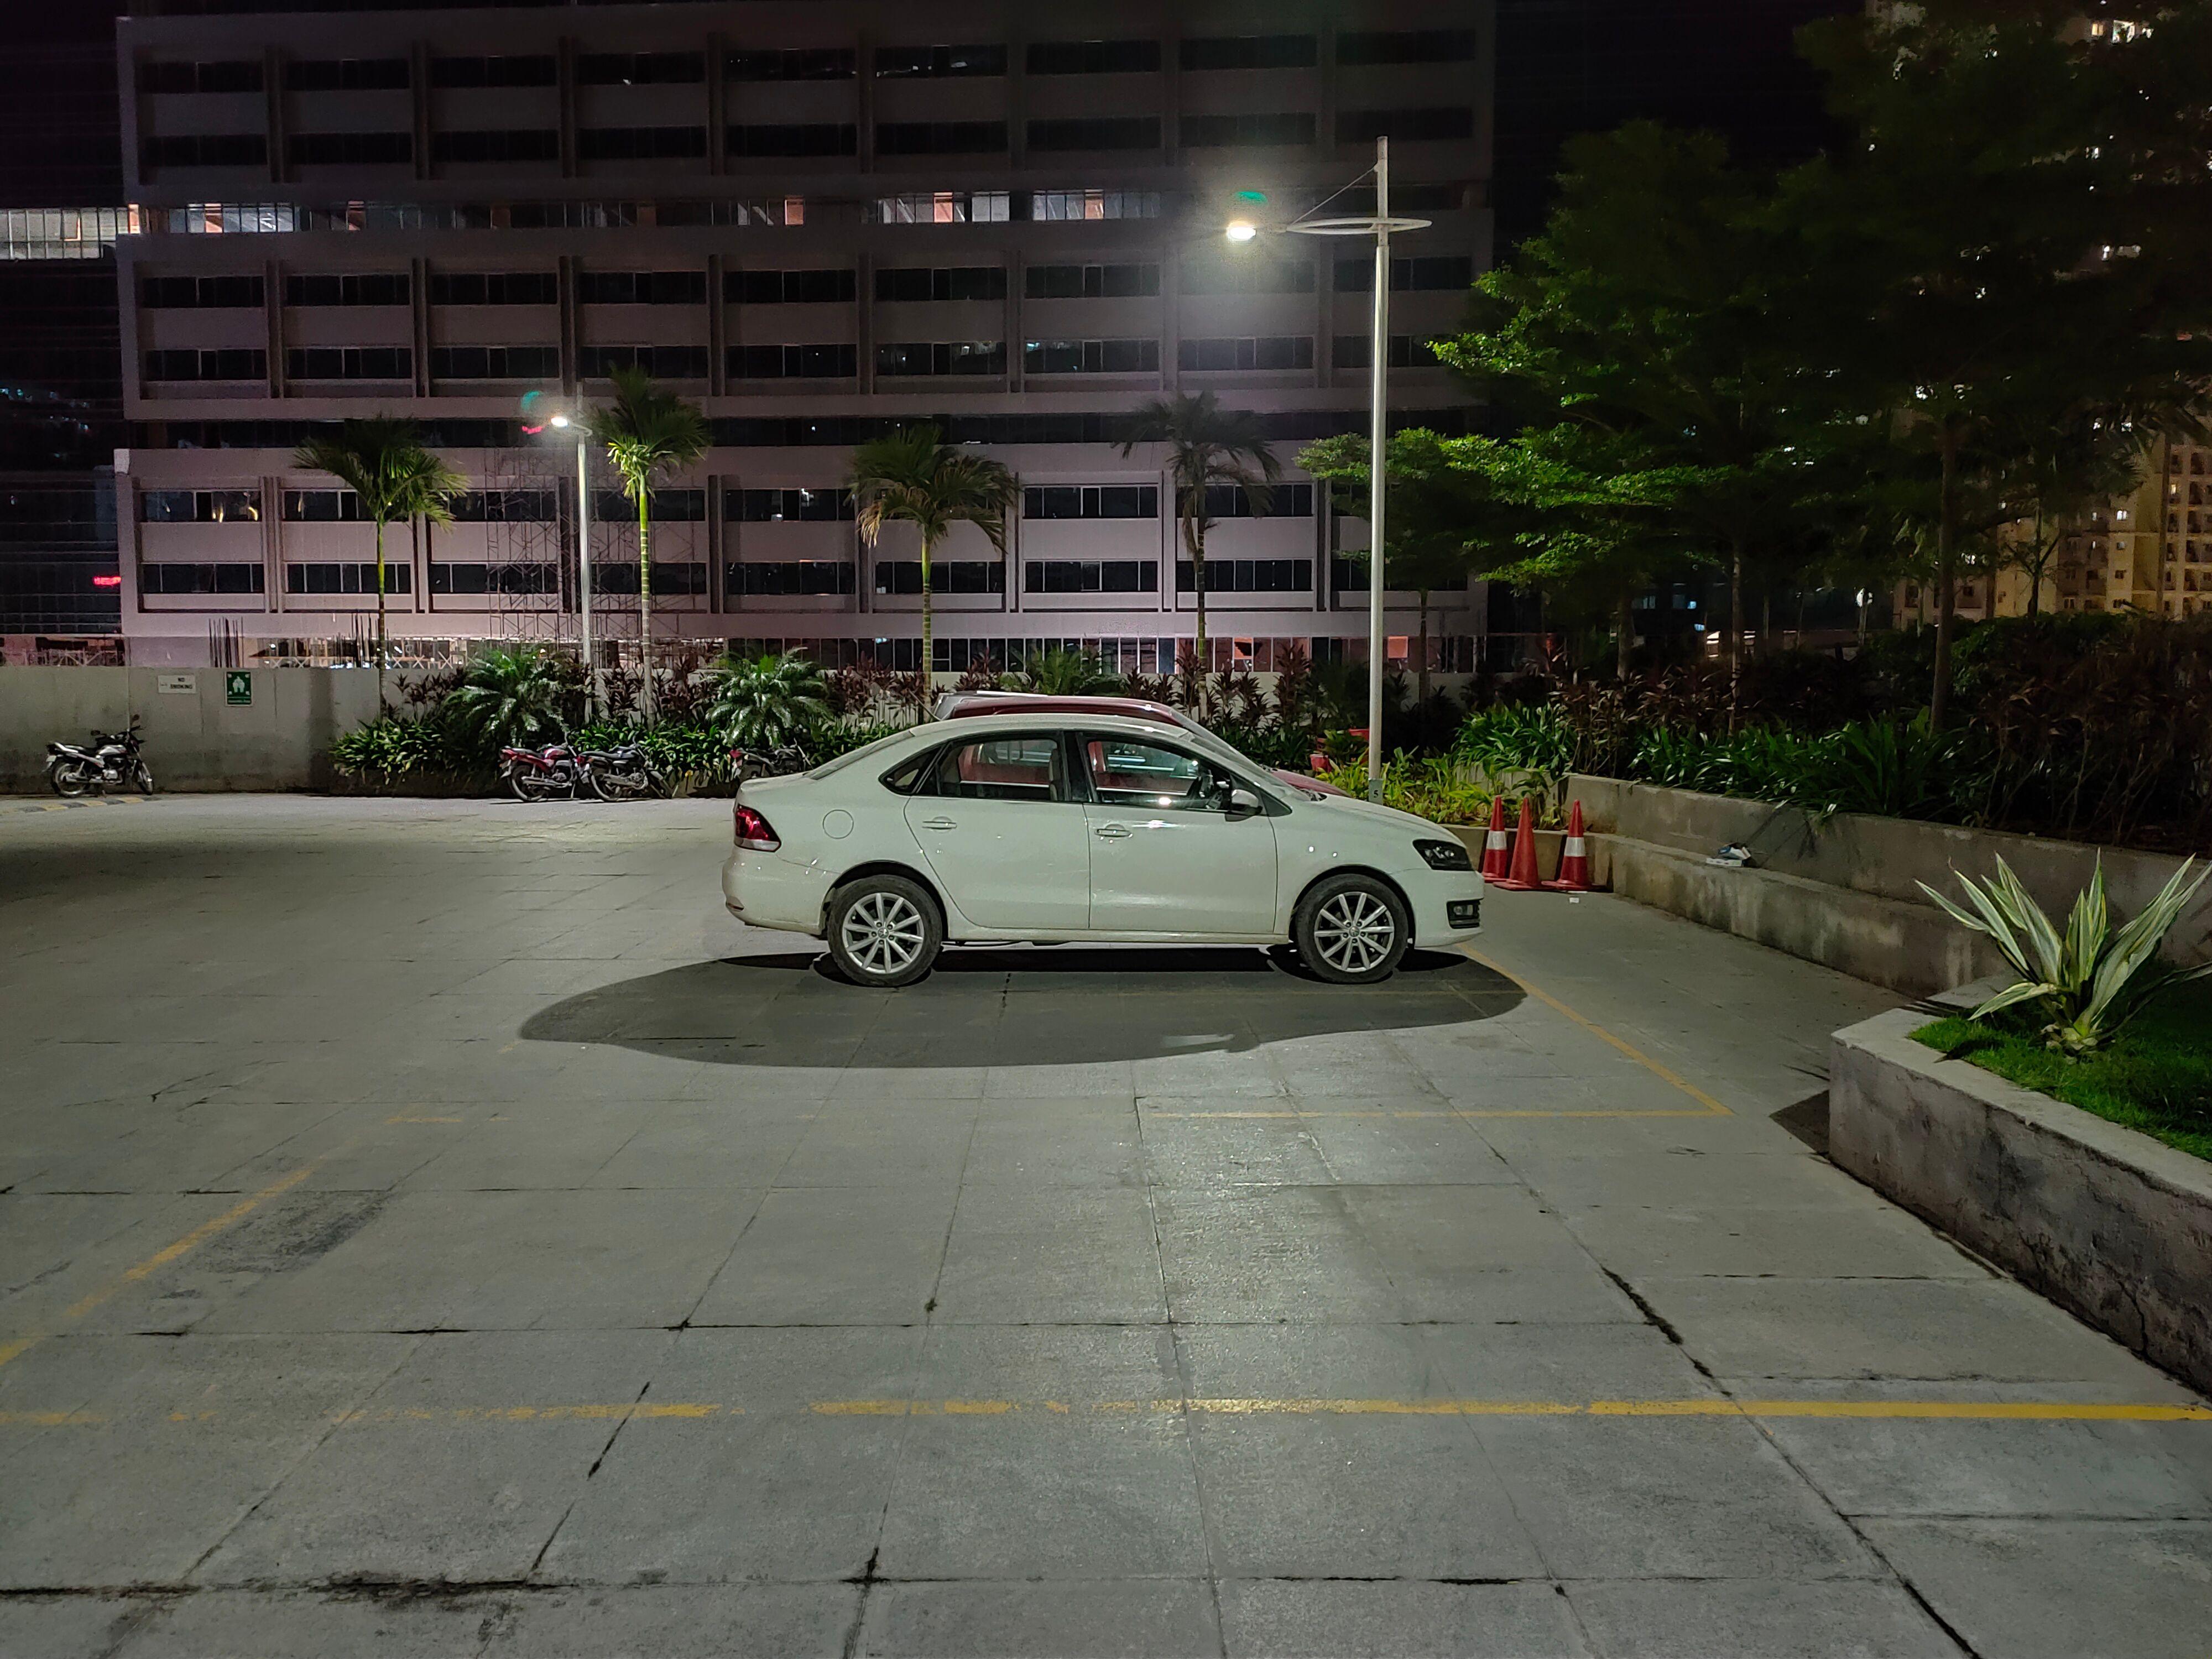 Realme X Camera Sample - Low Light Night Mode